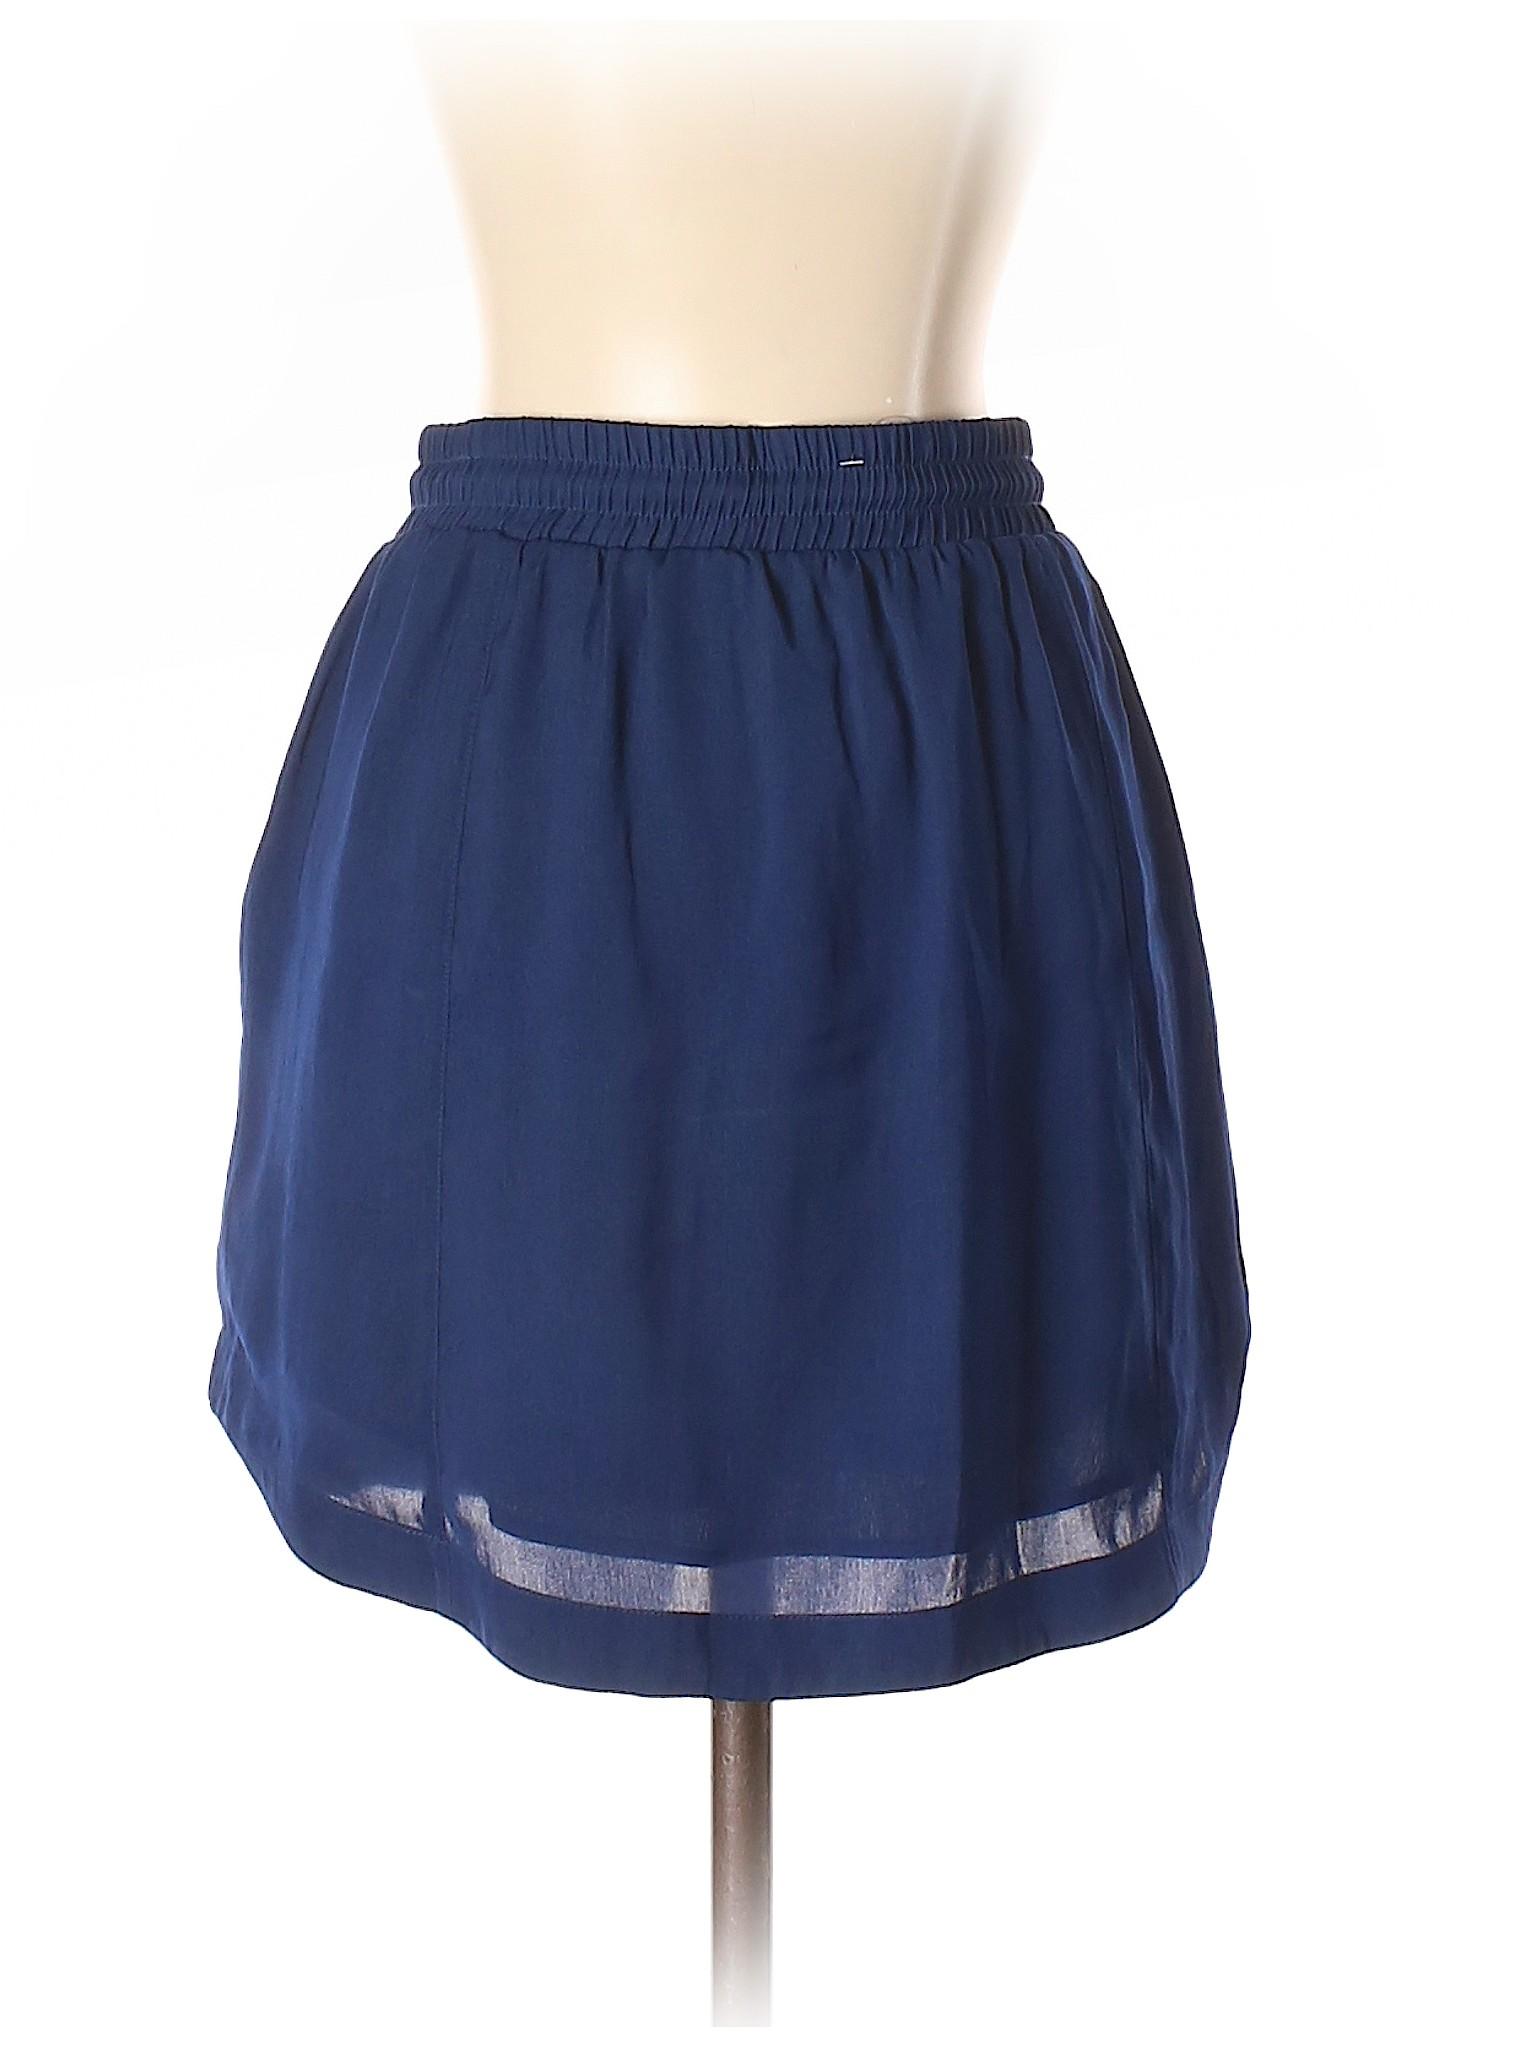 Leisure Casual Skirt Leisure Townsen winter Townsen winter Leisure Casual Skirt dPUIdqS